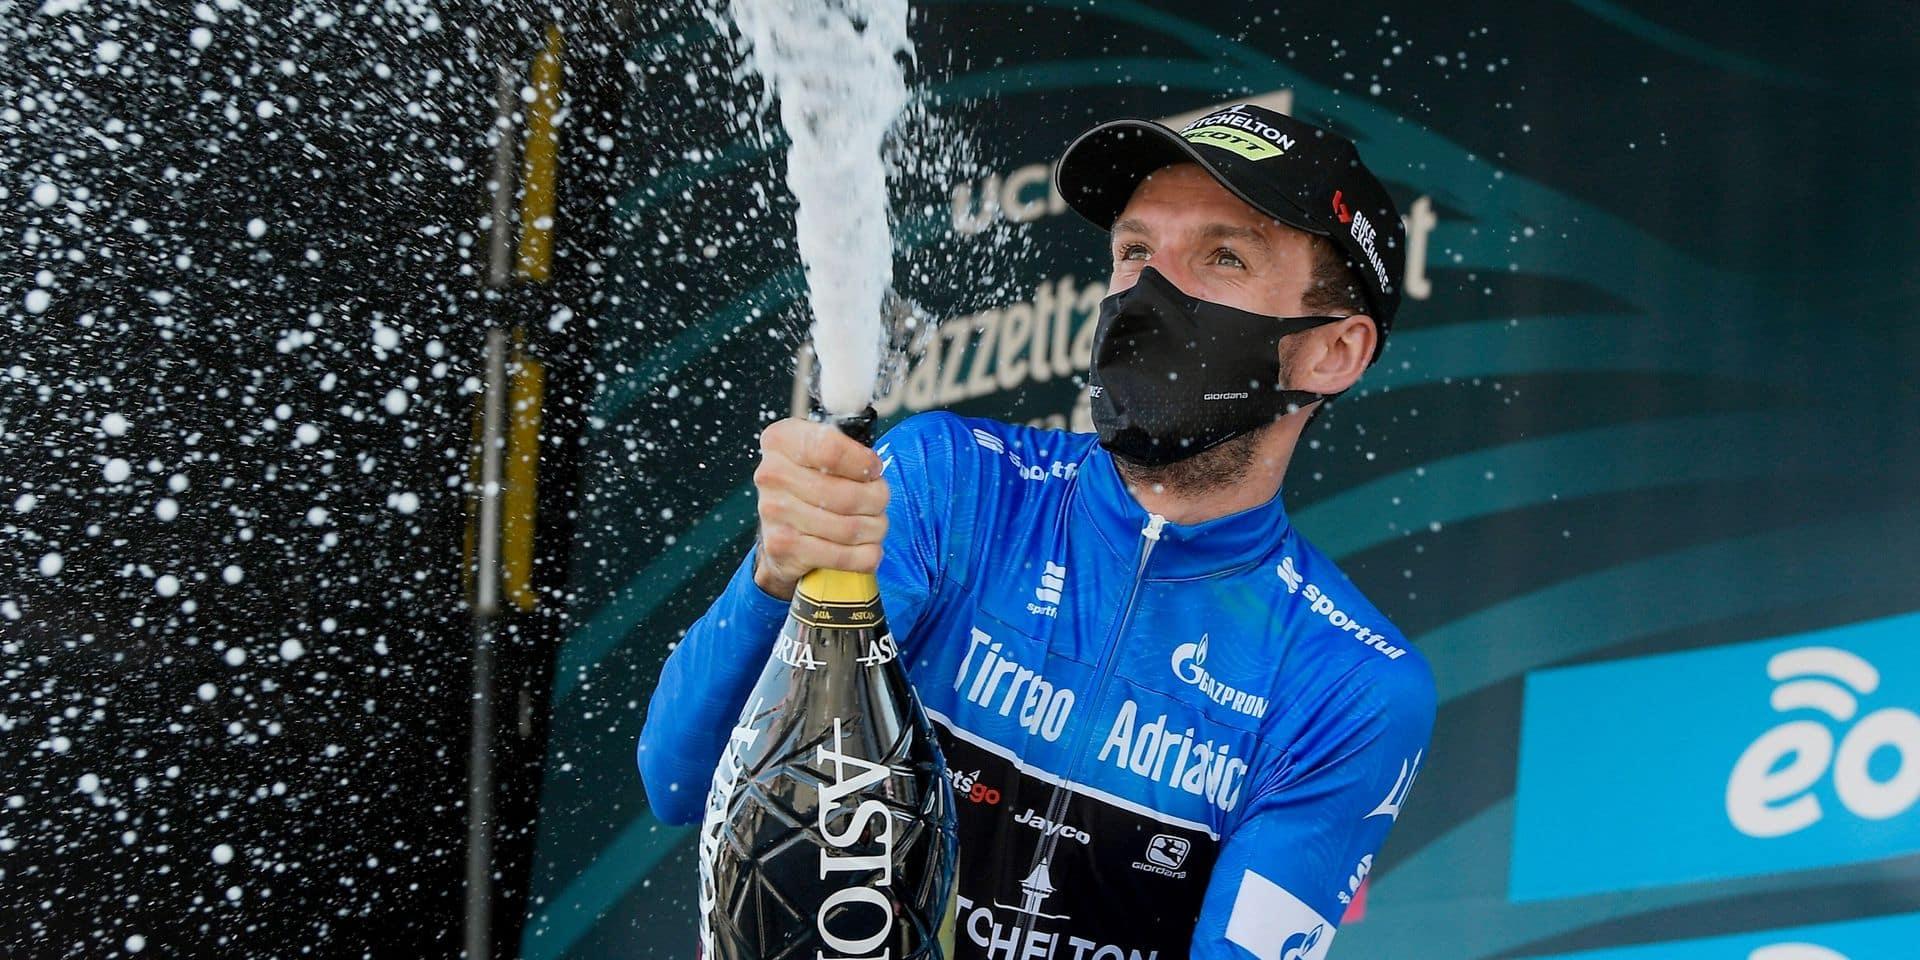 Tirreno-Adriatico: Simon Yates vainqueur final, Filippo Ganna gagne le chrono devant Campenaerts